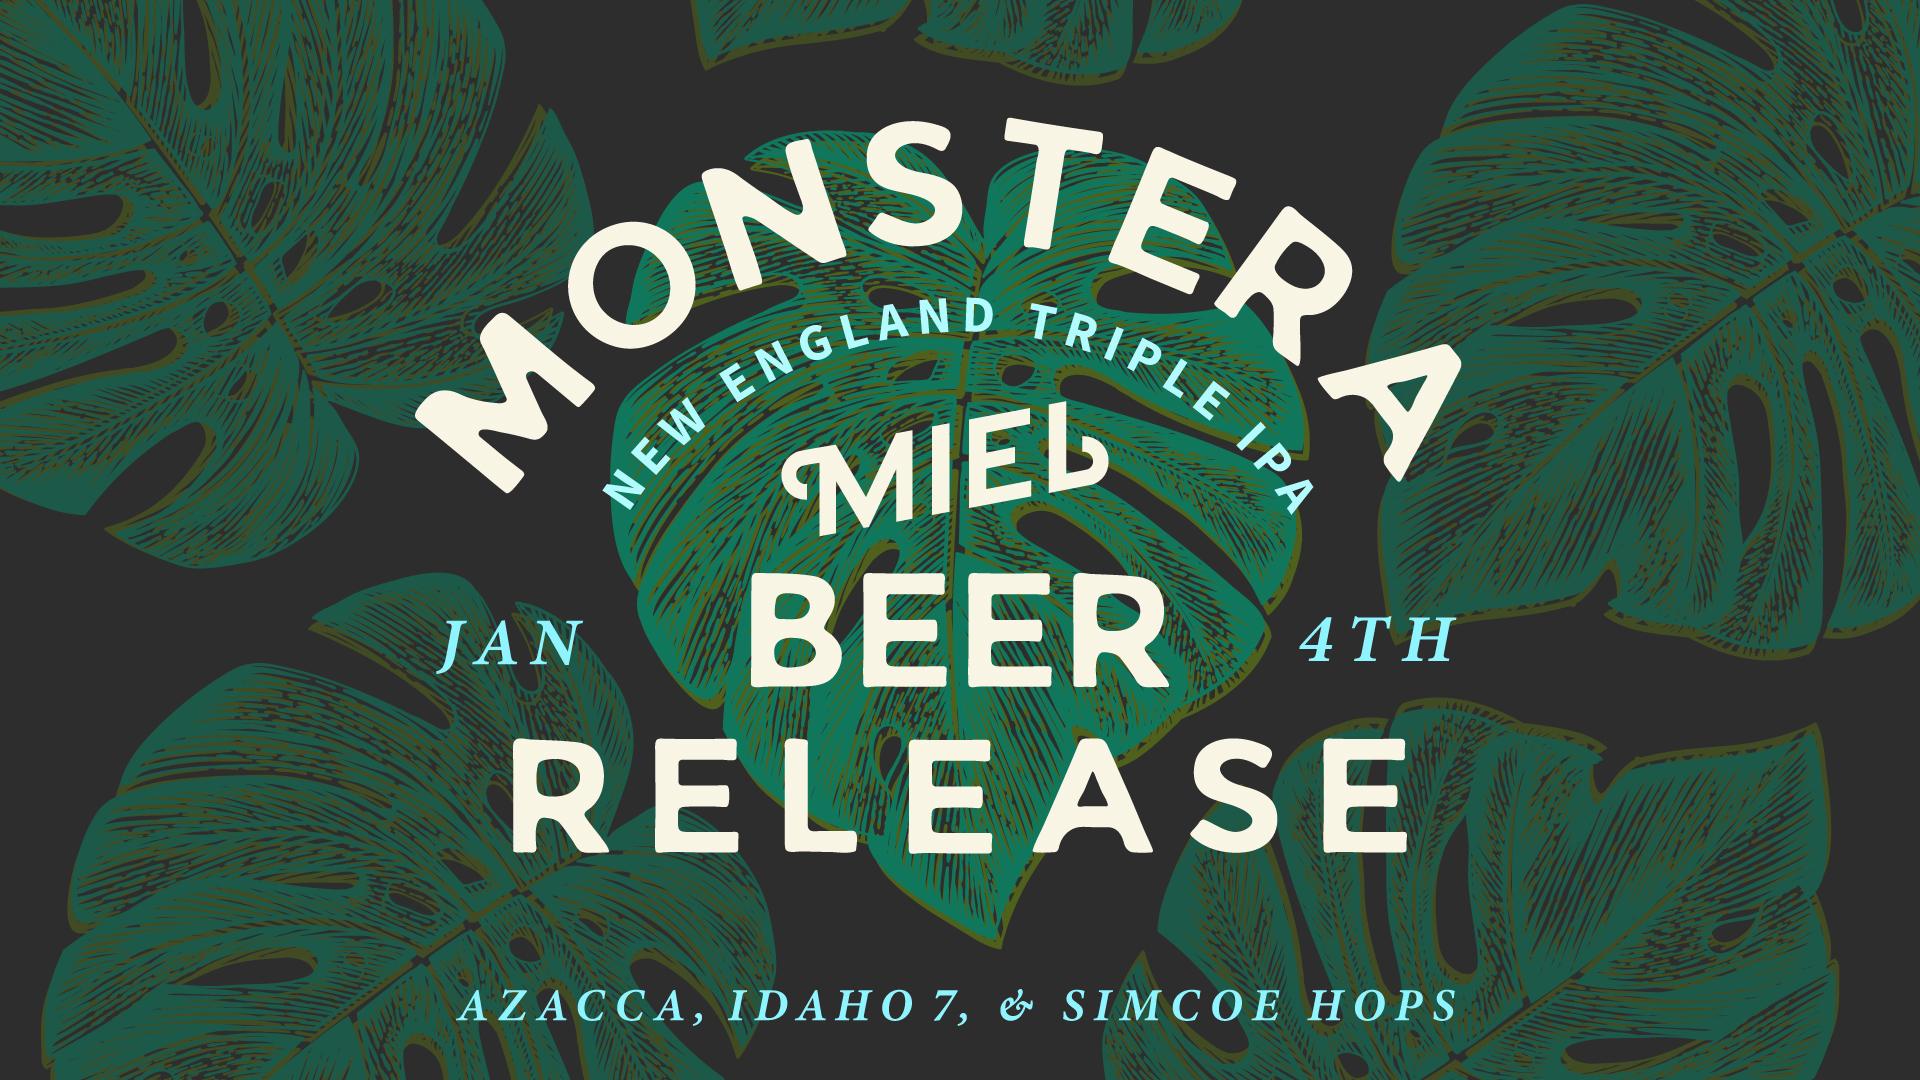 Miel Brewery_Monstera New England Triple IPA beer release